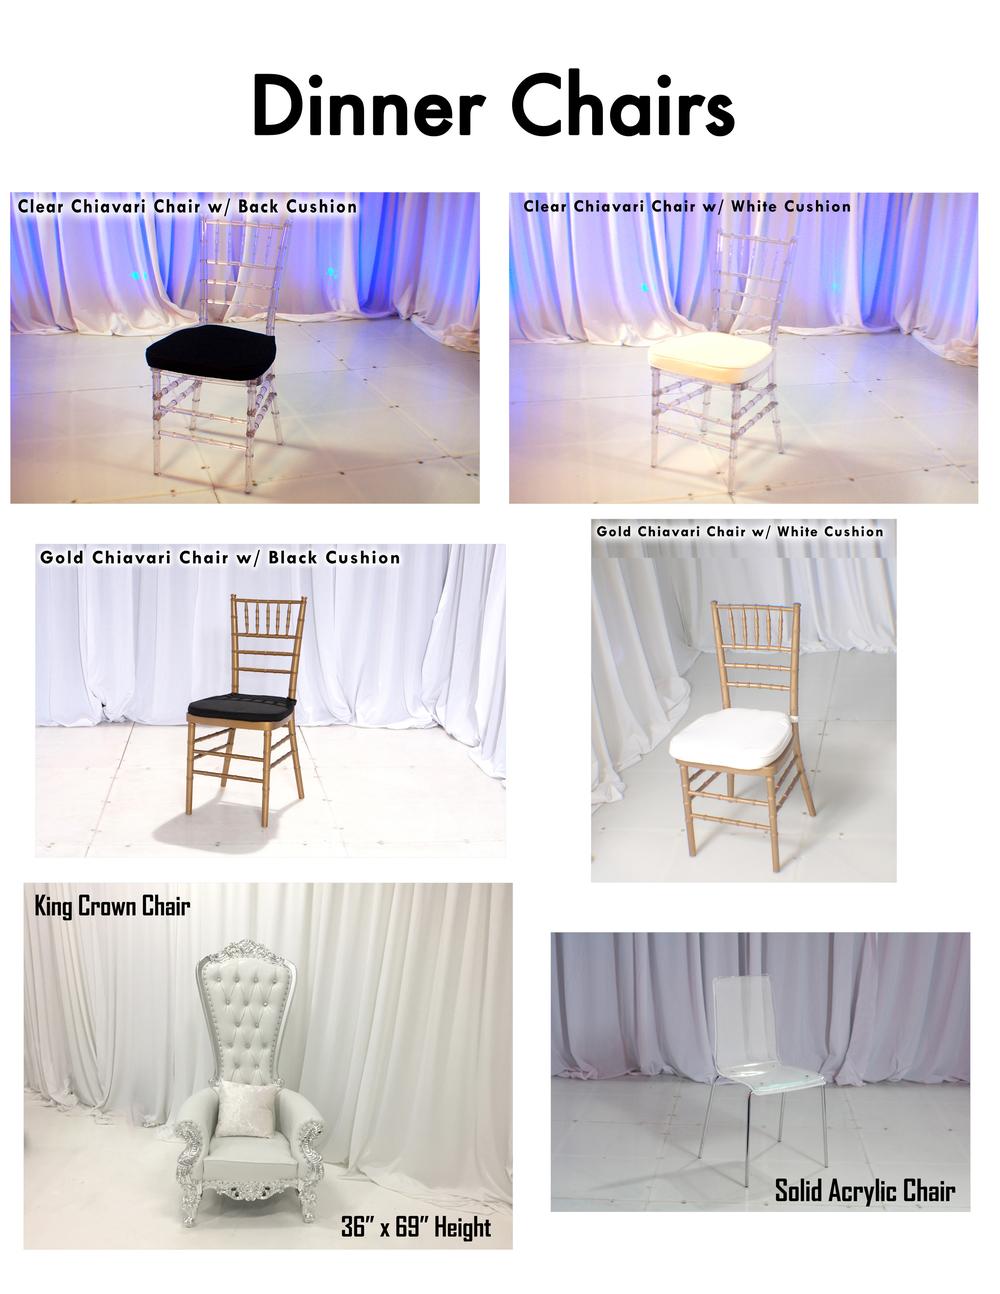 P45_Dinner Chairs.jpg